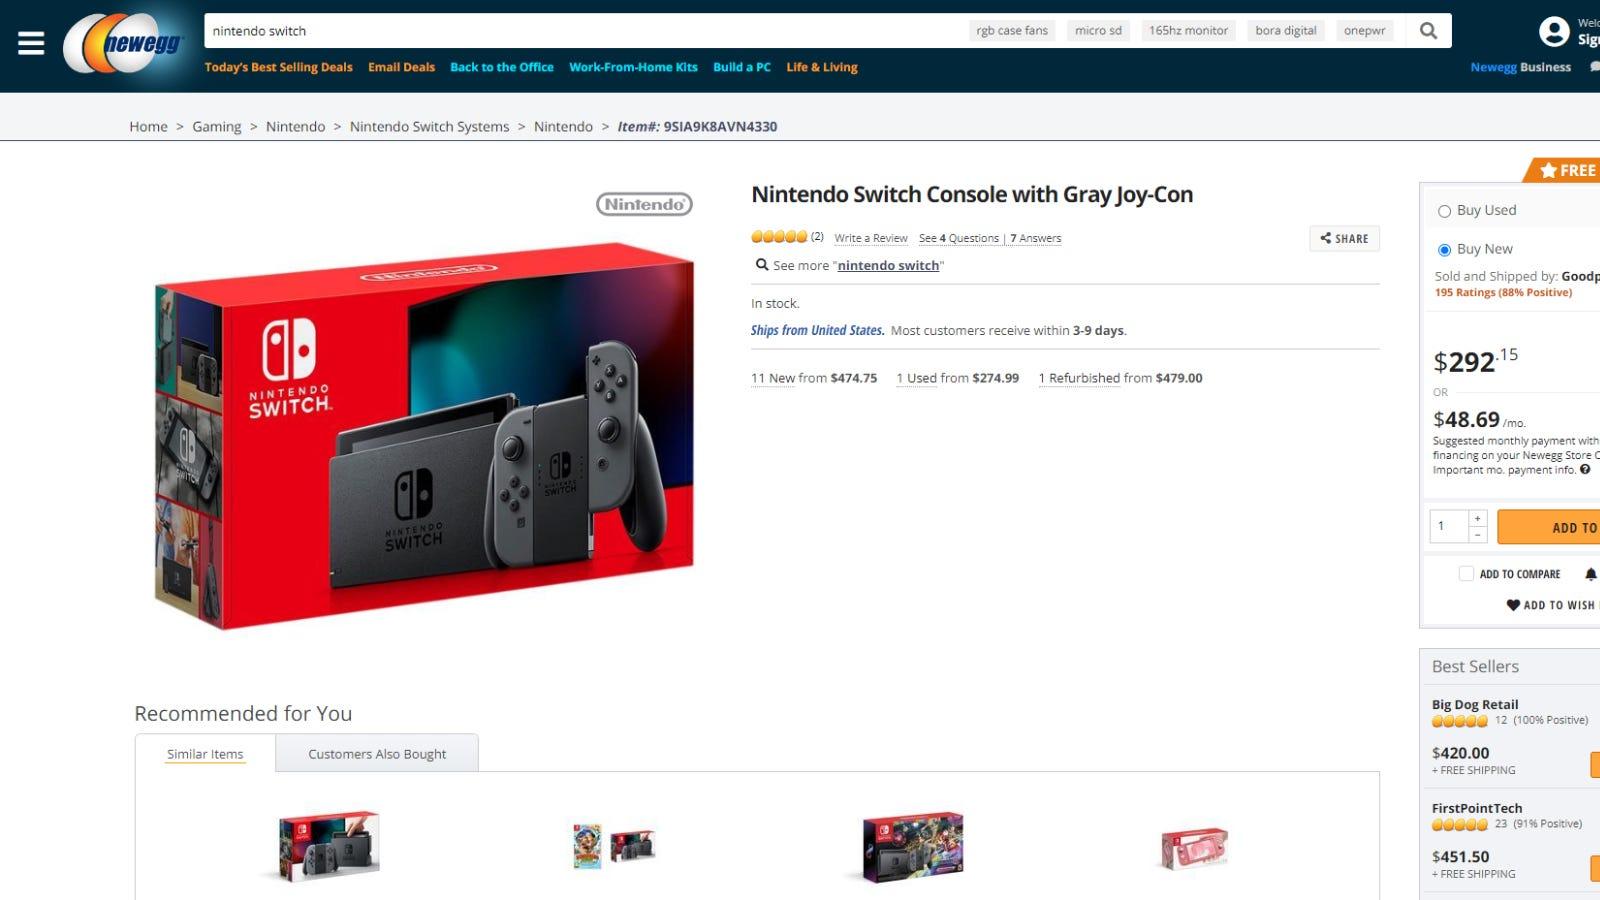 Nintendo Switch on Newegg